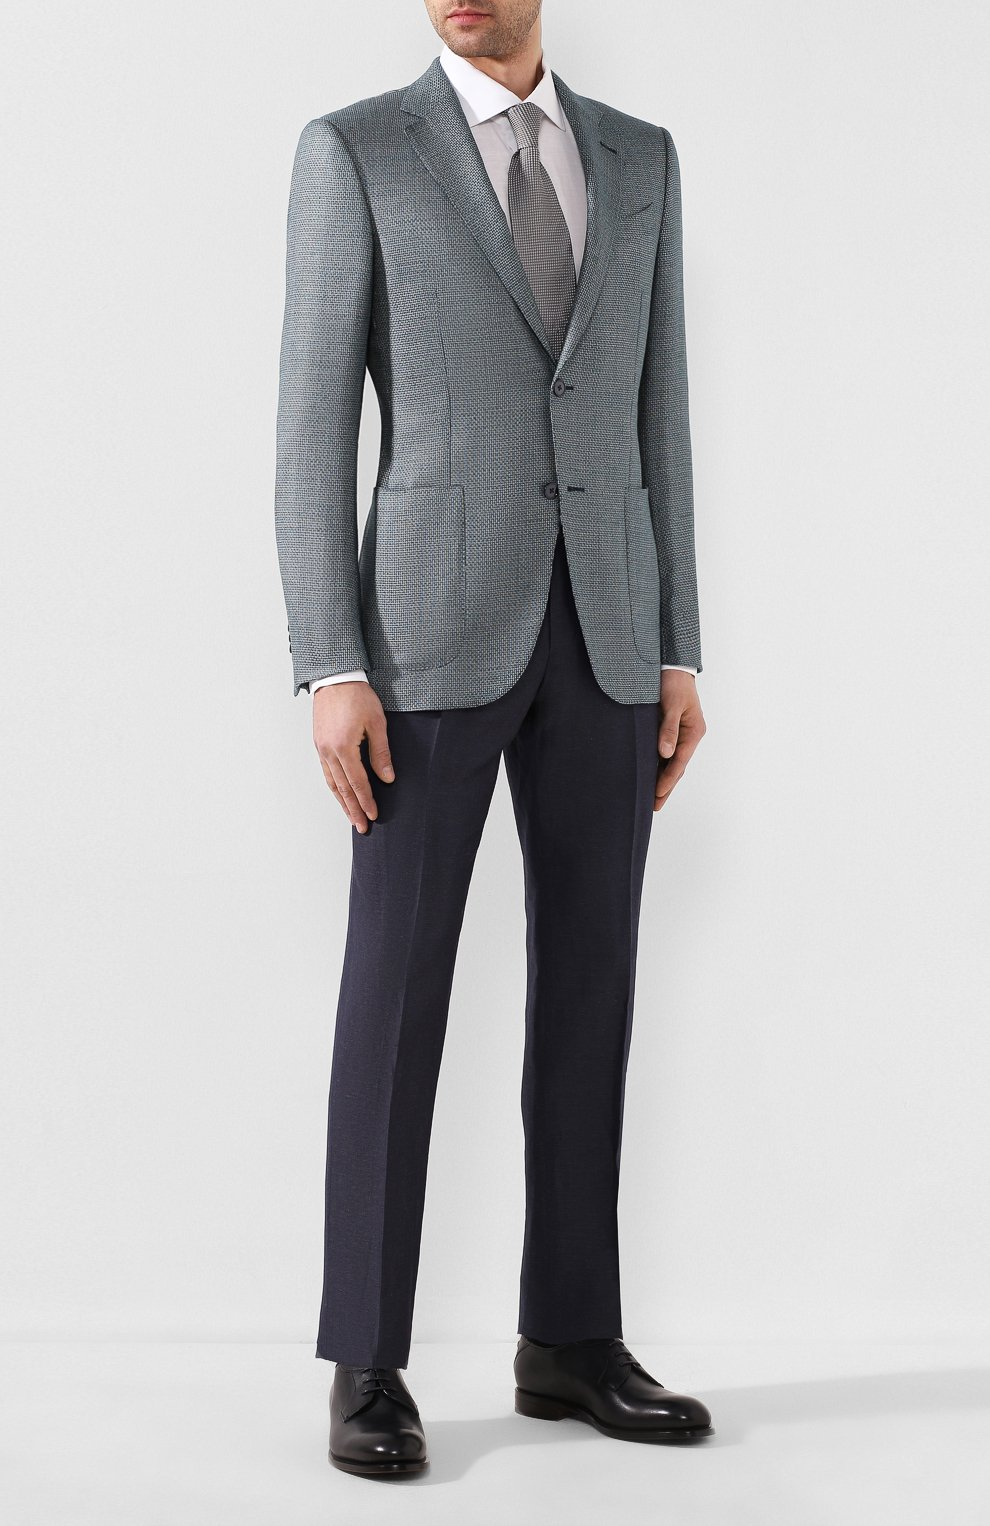 Мужские брюки из смеси шерсти и льна ERMENEGILDO ZEGNA синего цвета, арт. 718F03/75F812 | Фото 2